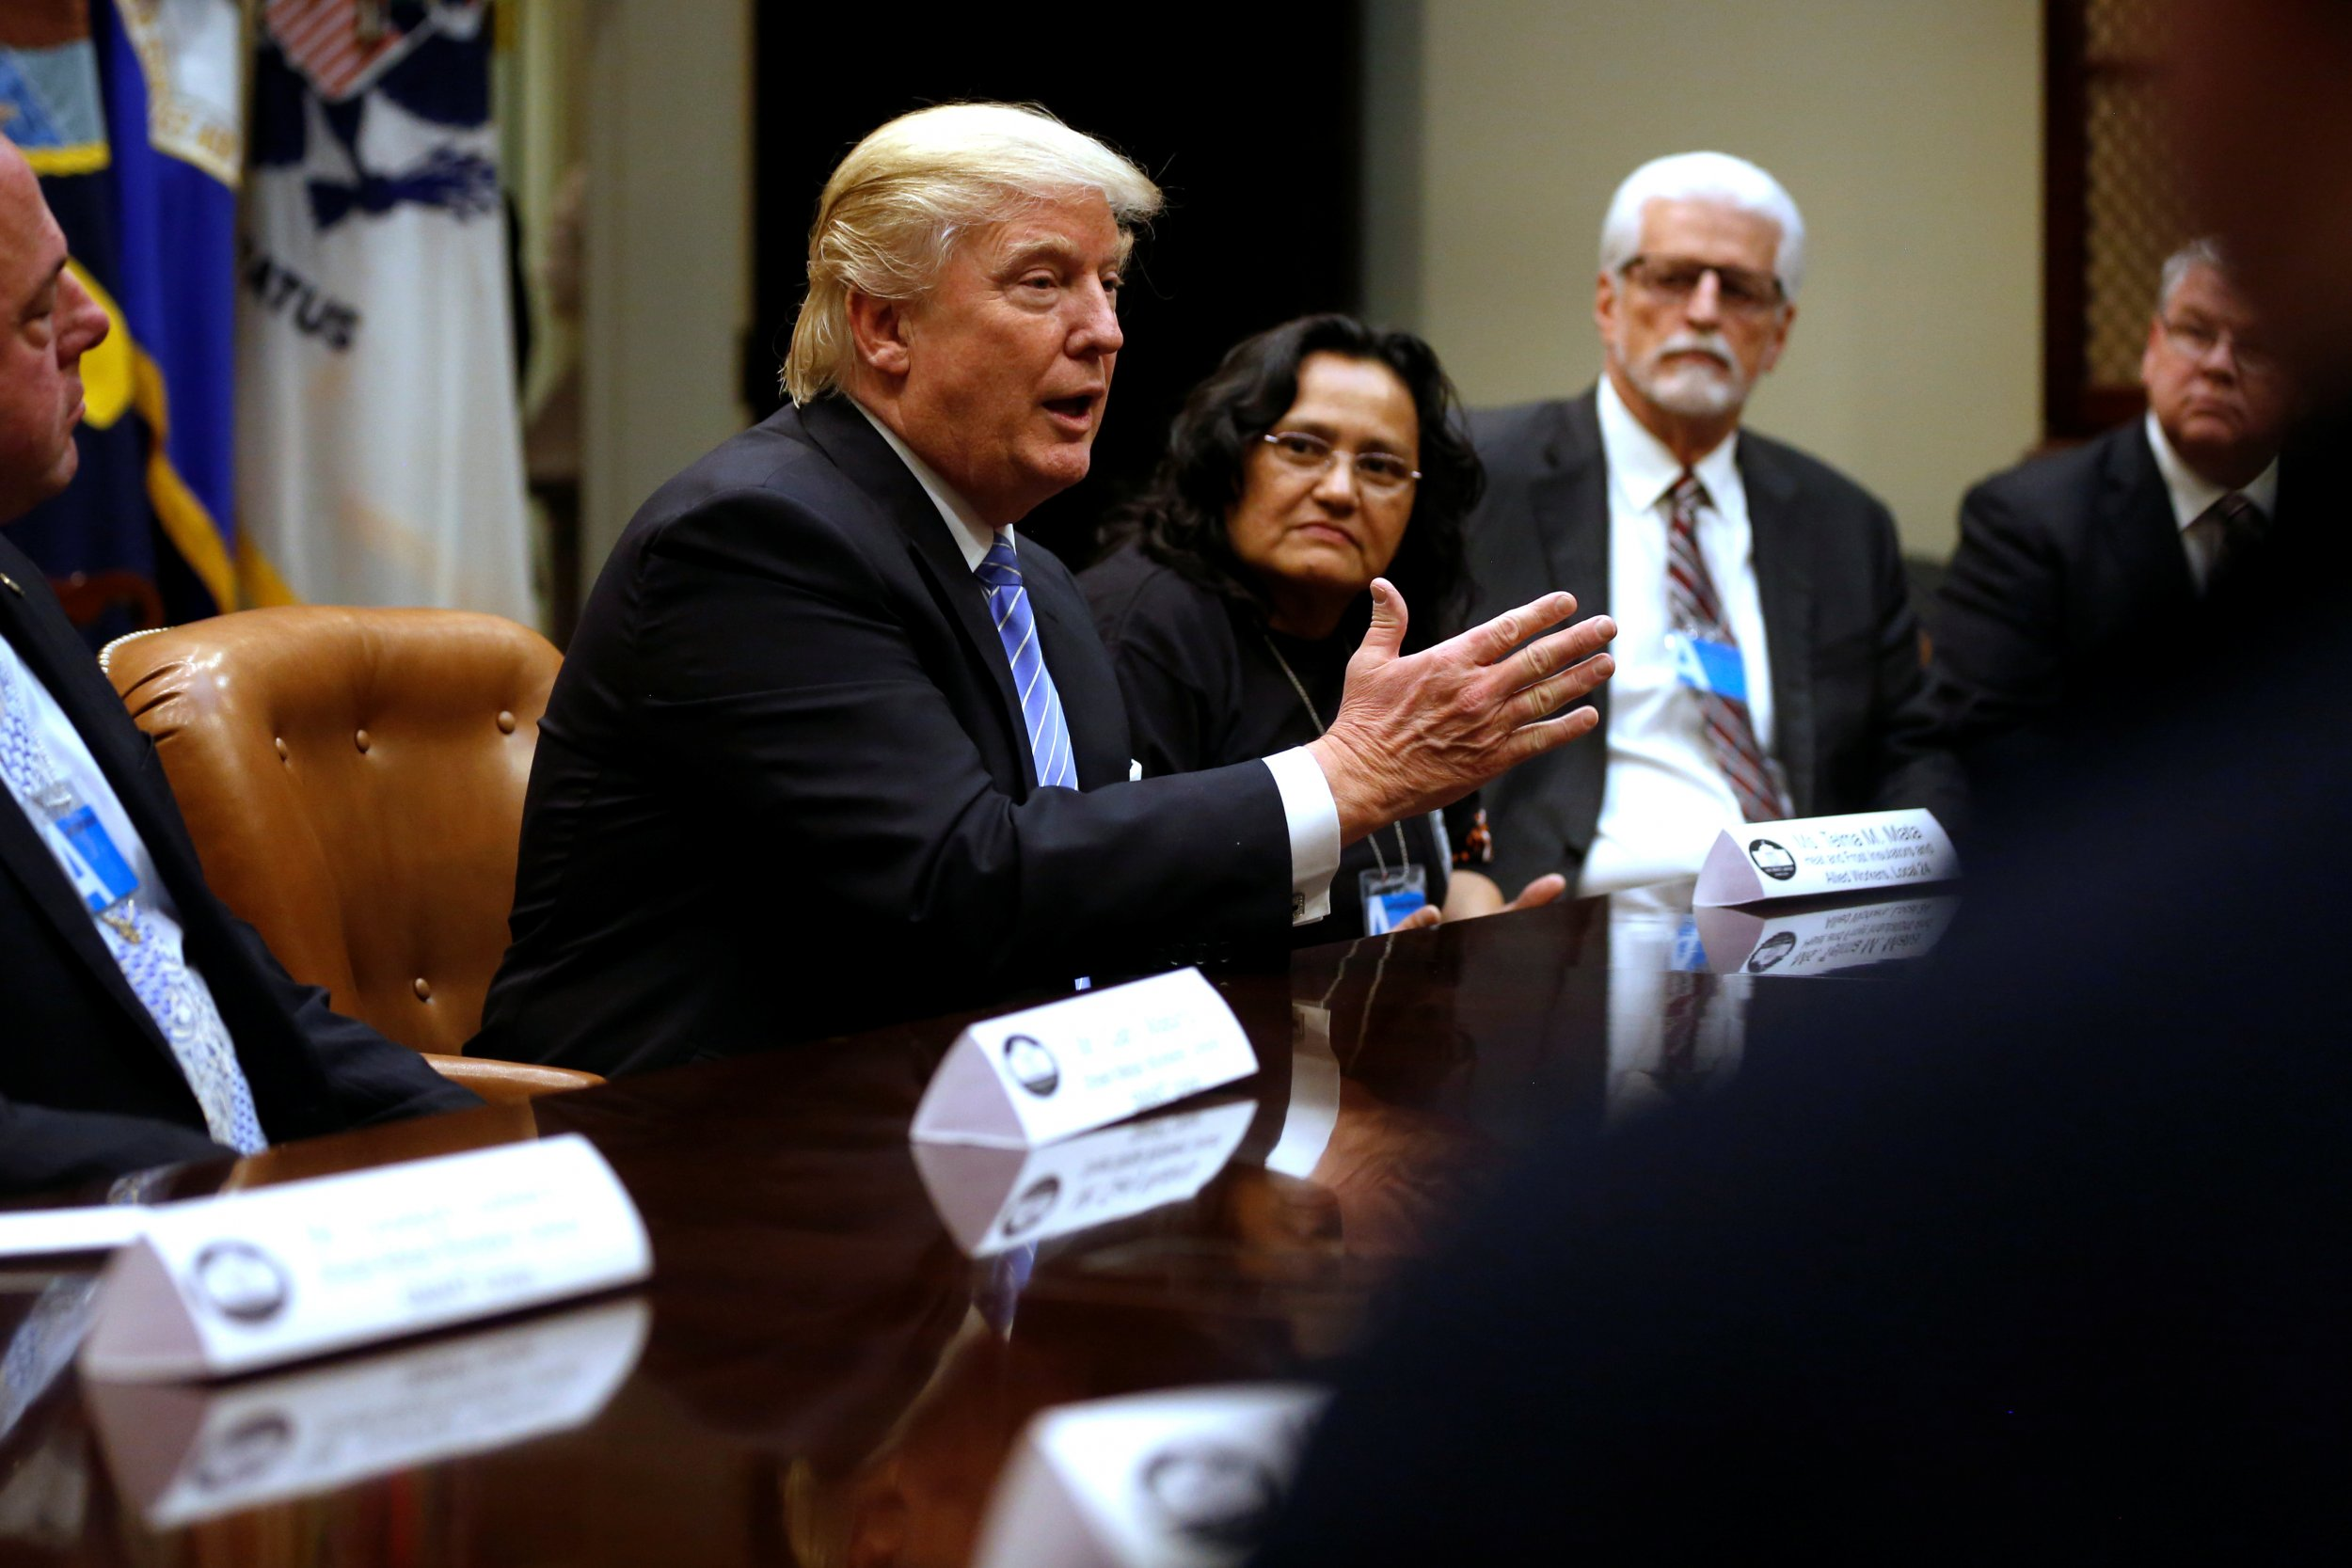 African migrants left stranded: Trump to limit US refugee intake